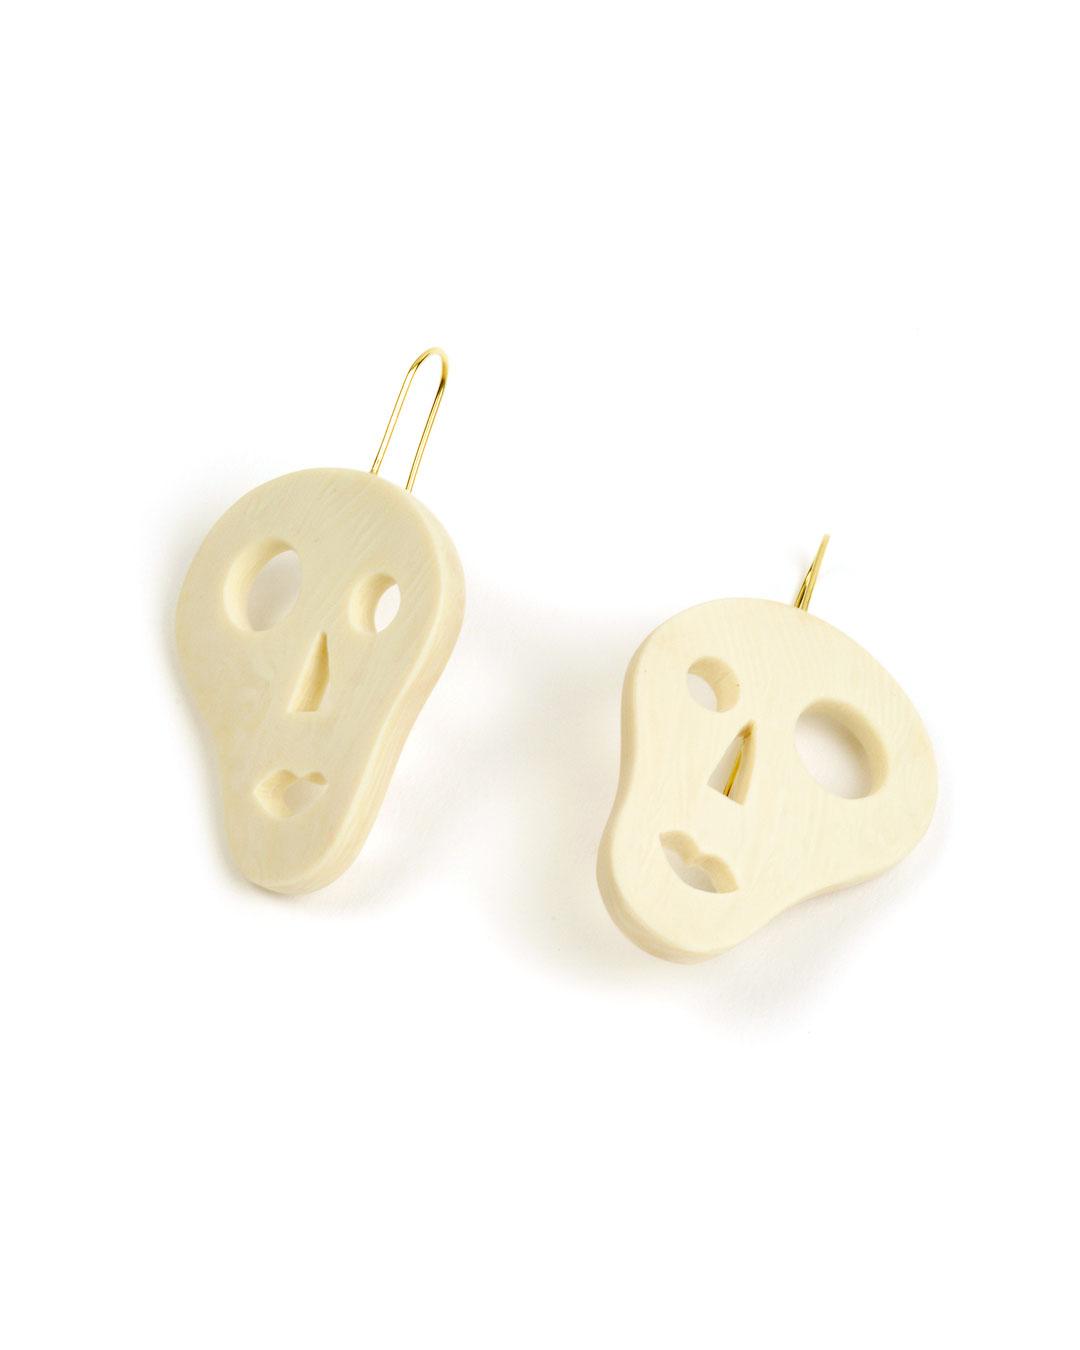 Julia Walter, Little Skulls, 2019, earrings; Galalith, 14ct gold, 35 x 40 x 5 mm, €670